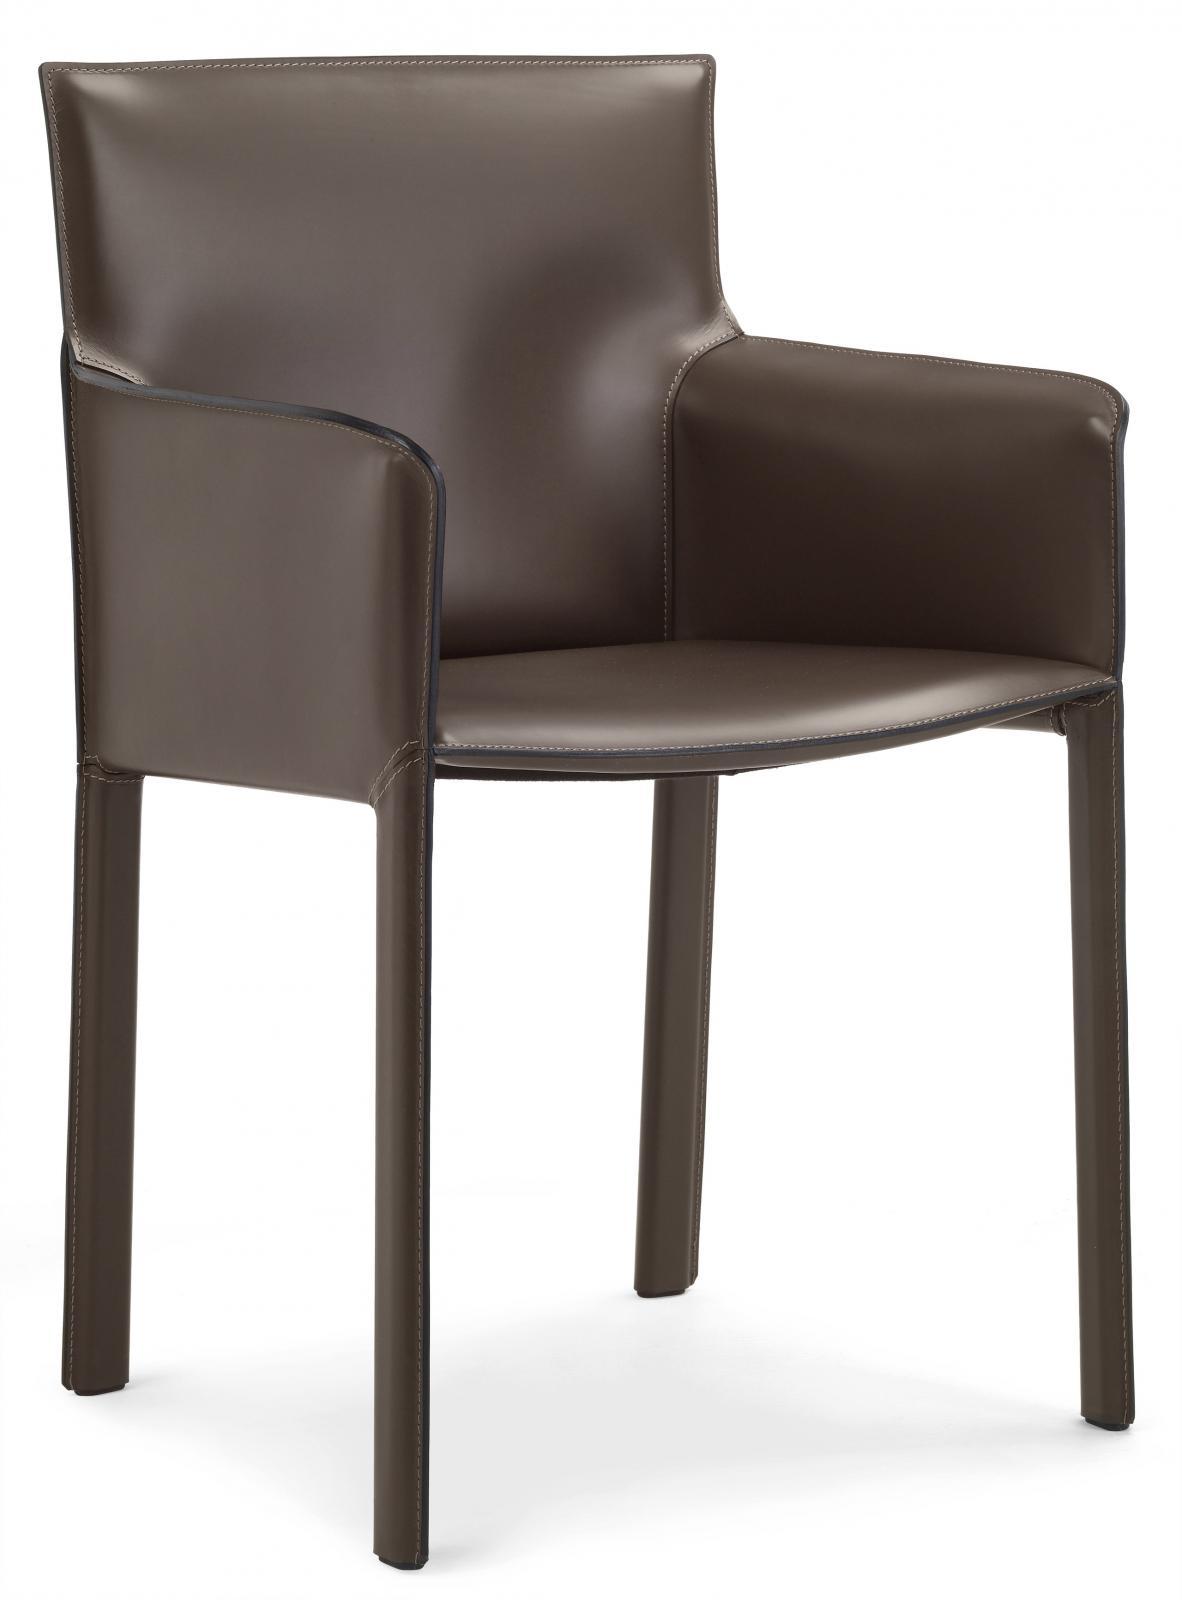 MDC 101 Modern Dining Chairs